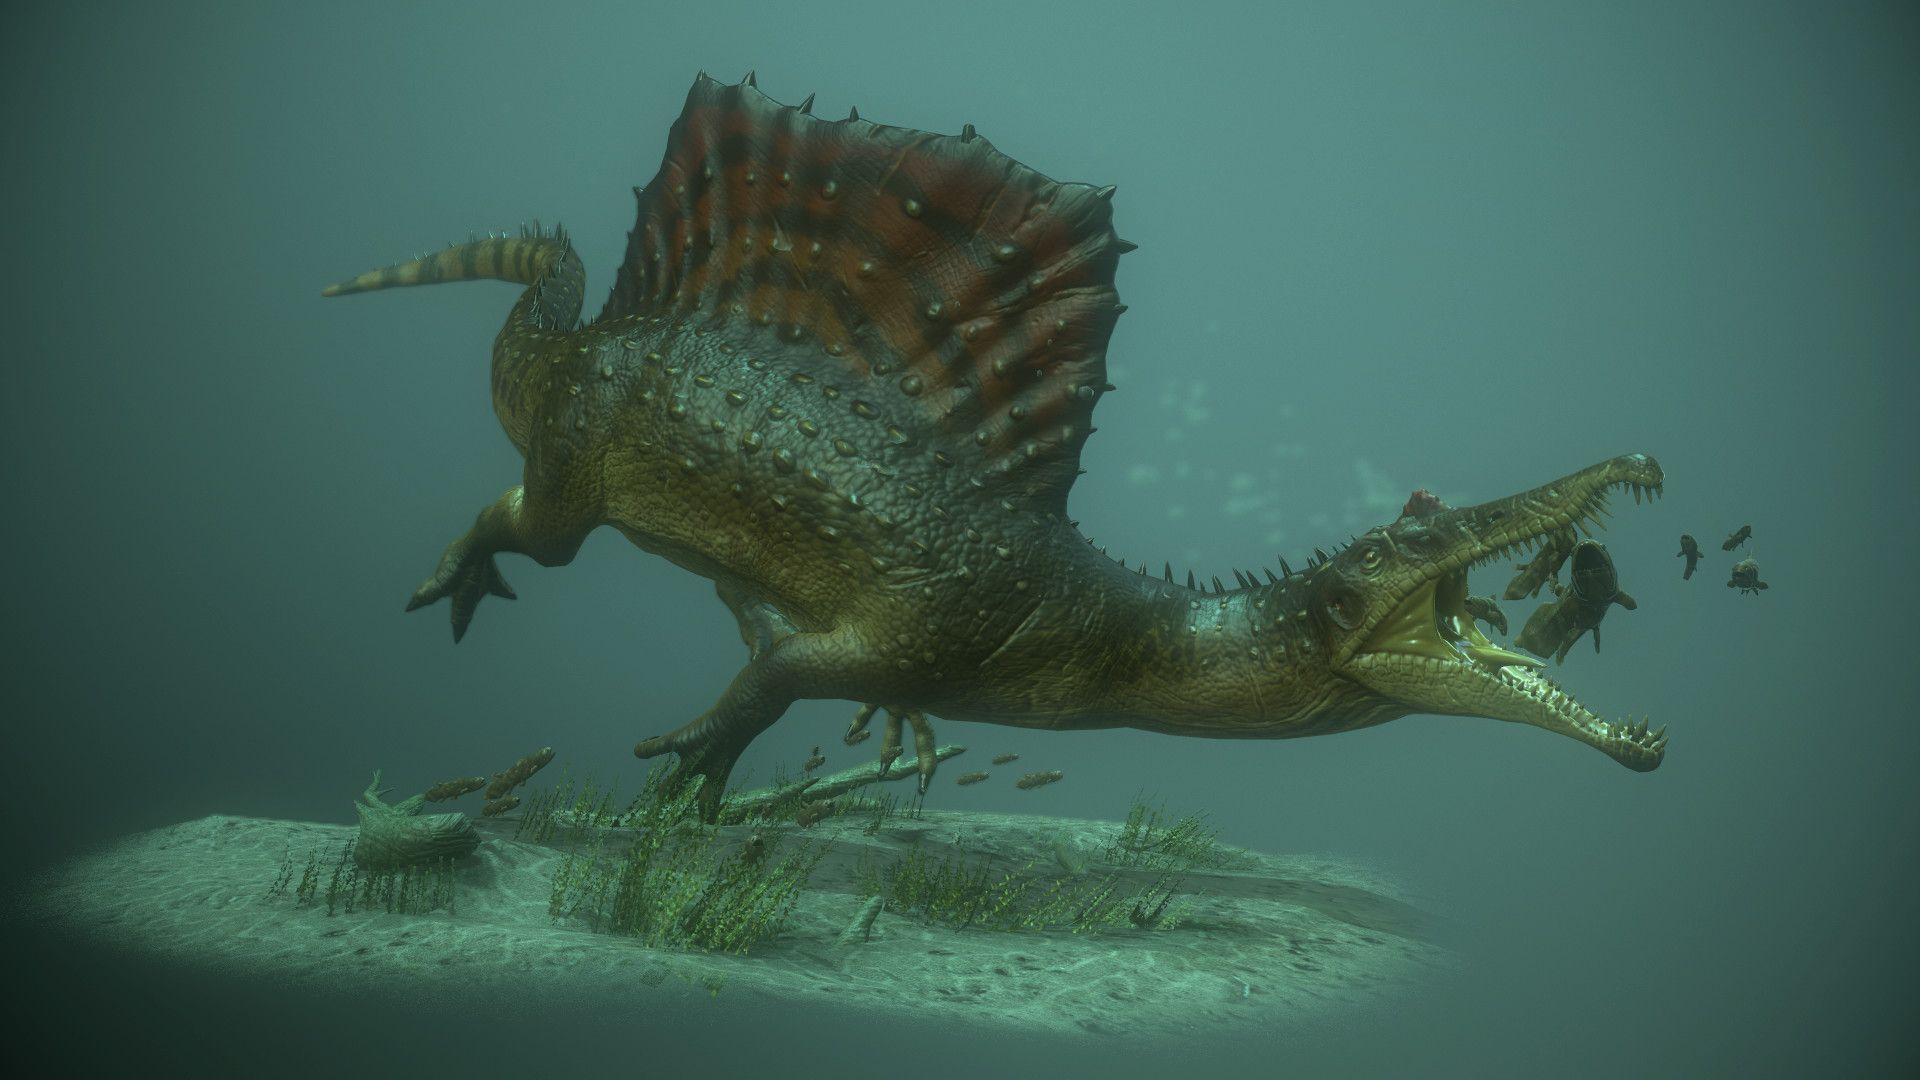 обеих водоплавающий динозавр картинки небо время полярного